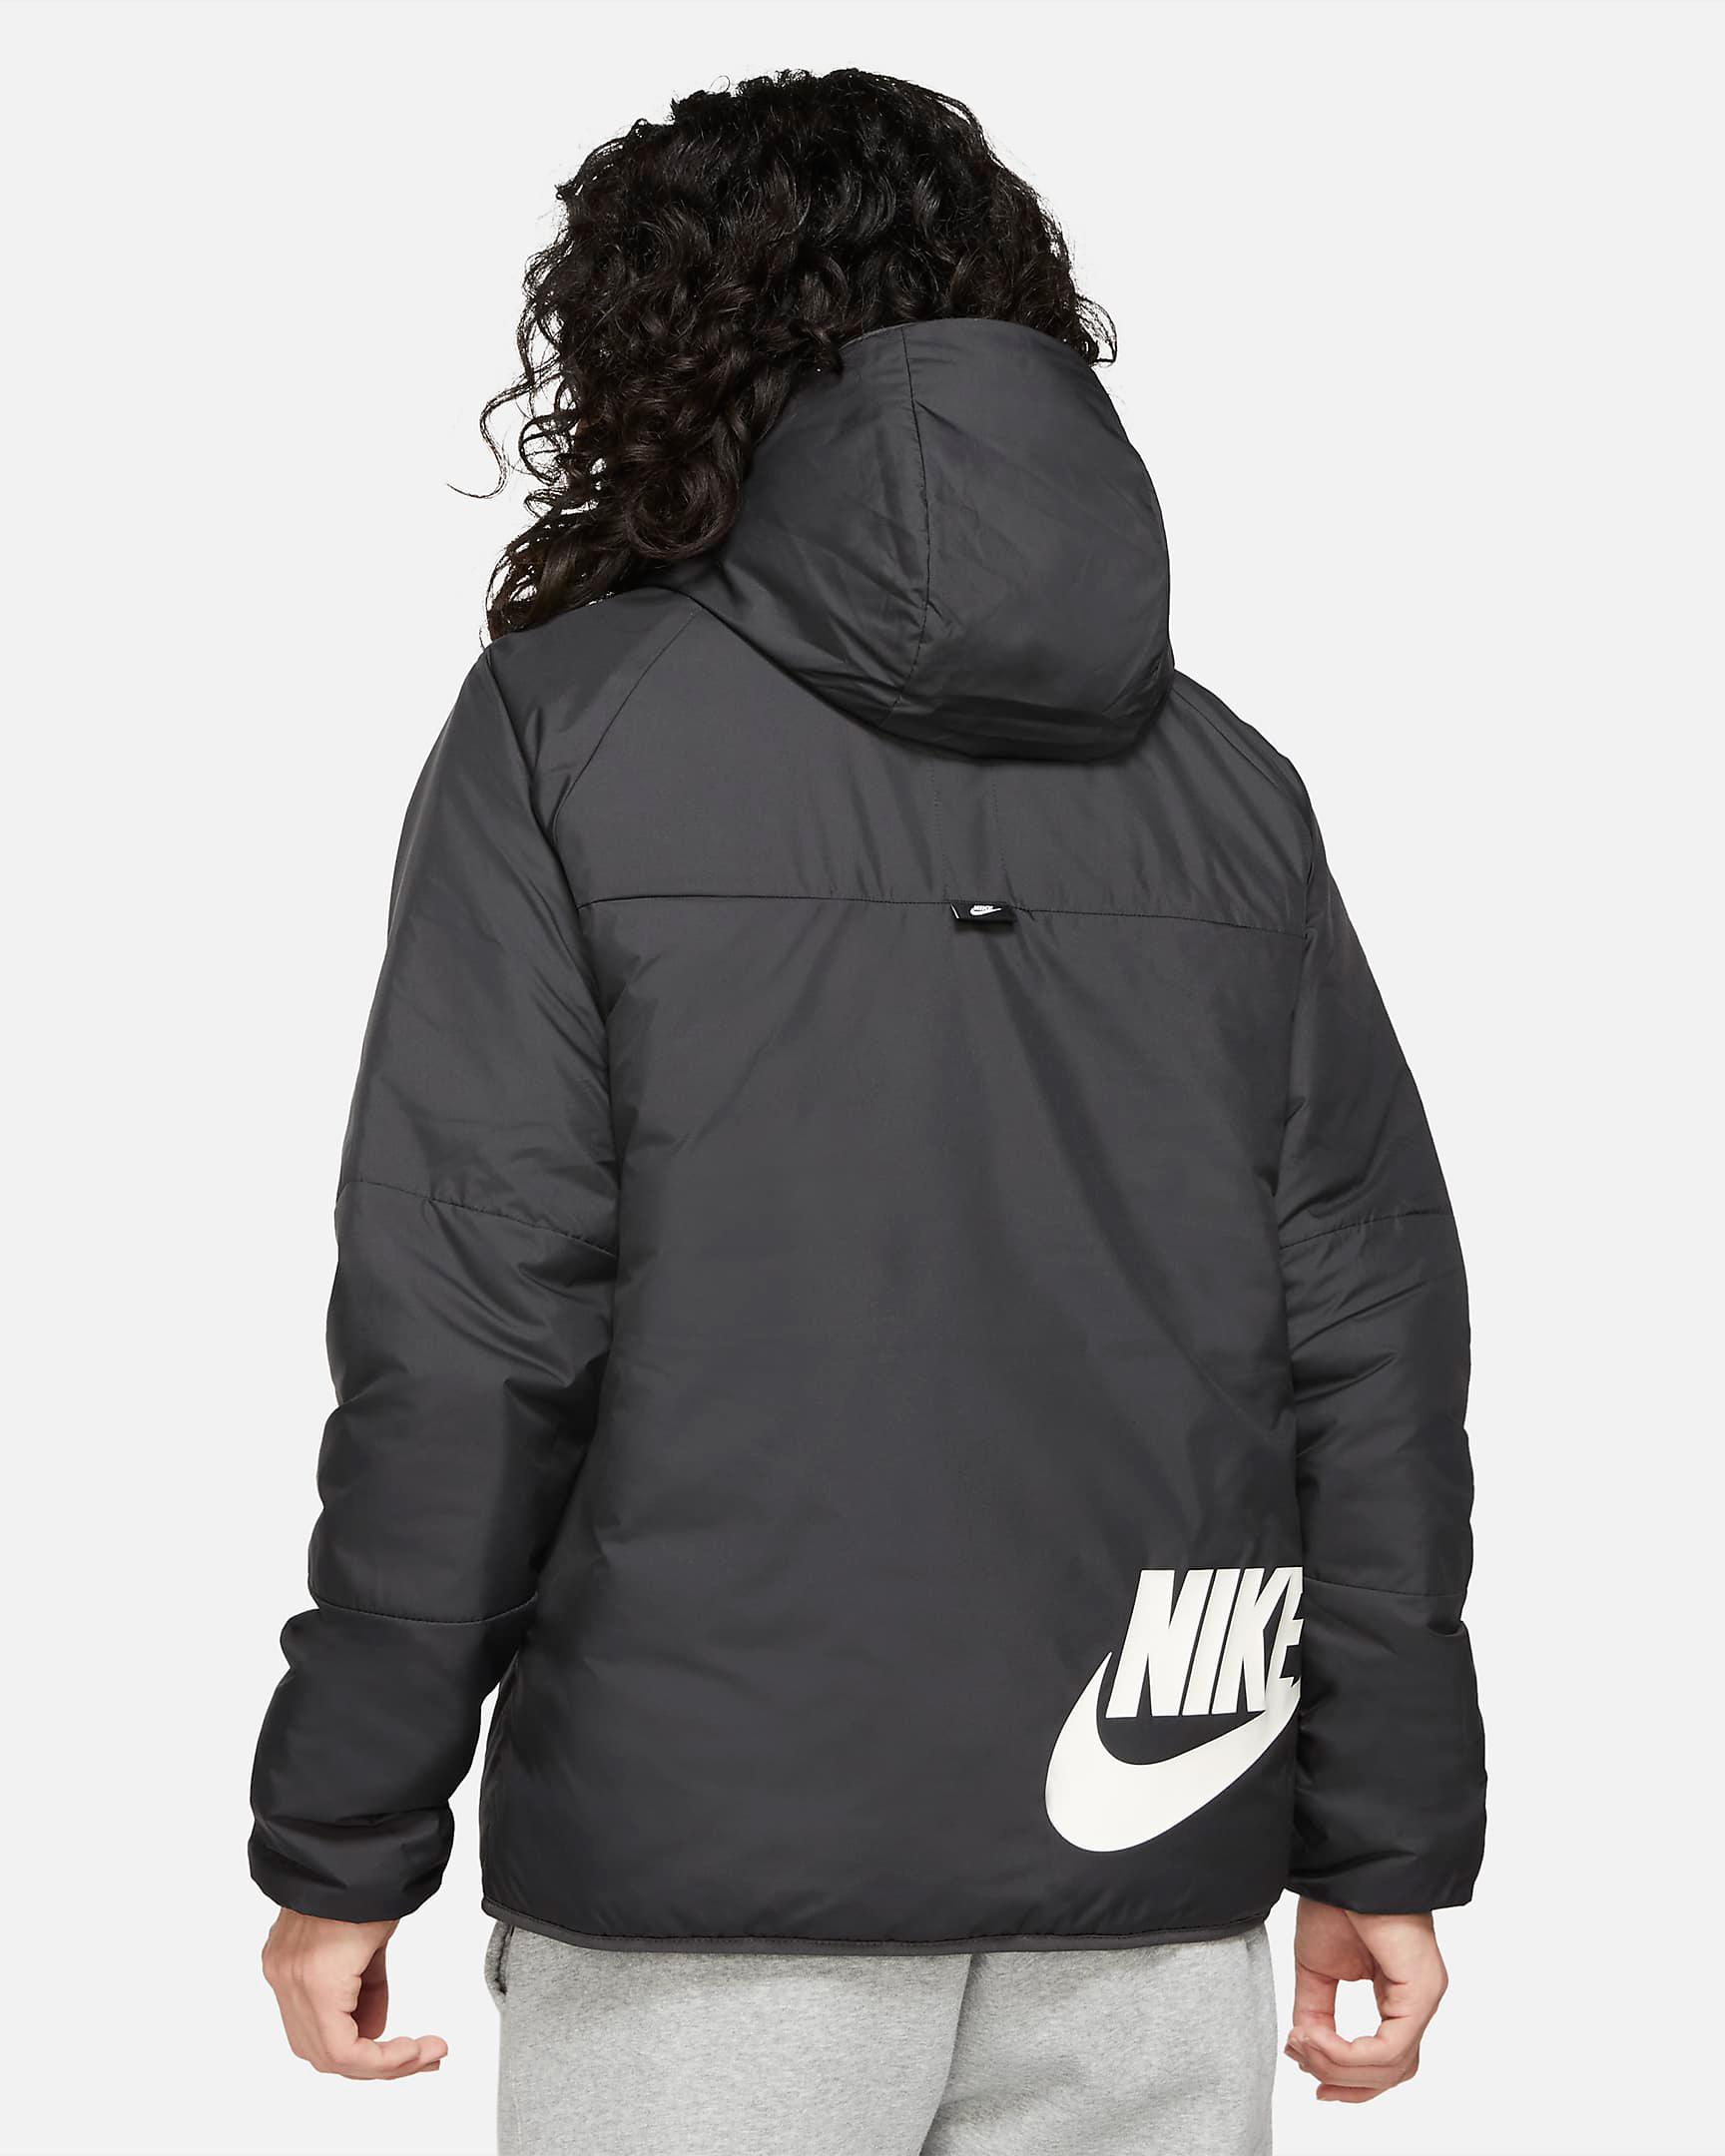 nike-sportswear-therma-fit-legacy-reversible-hooded-jacket-black-sail-2